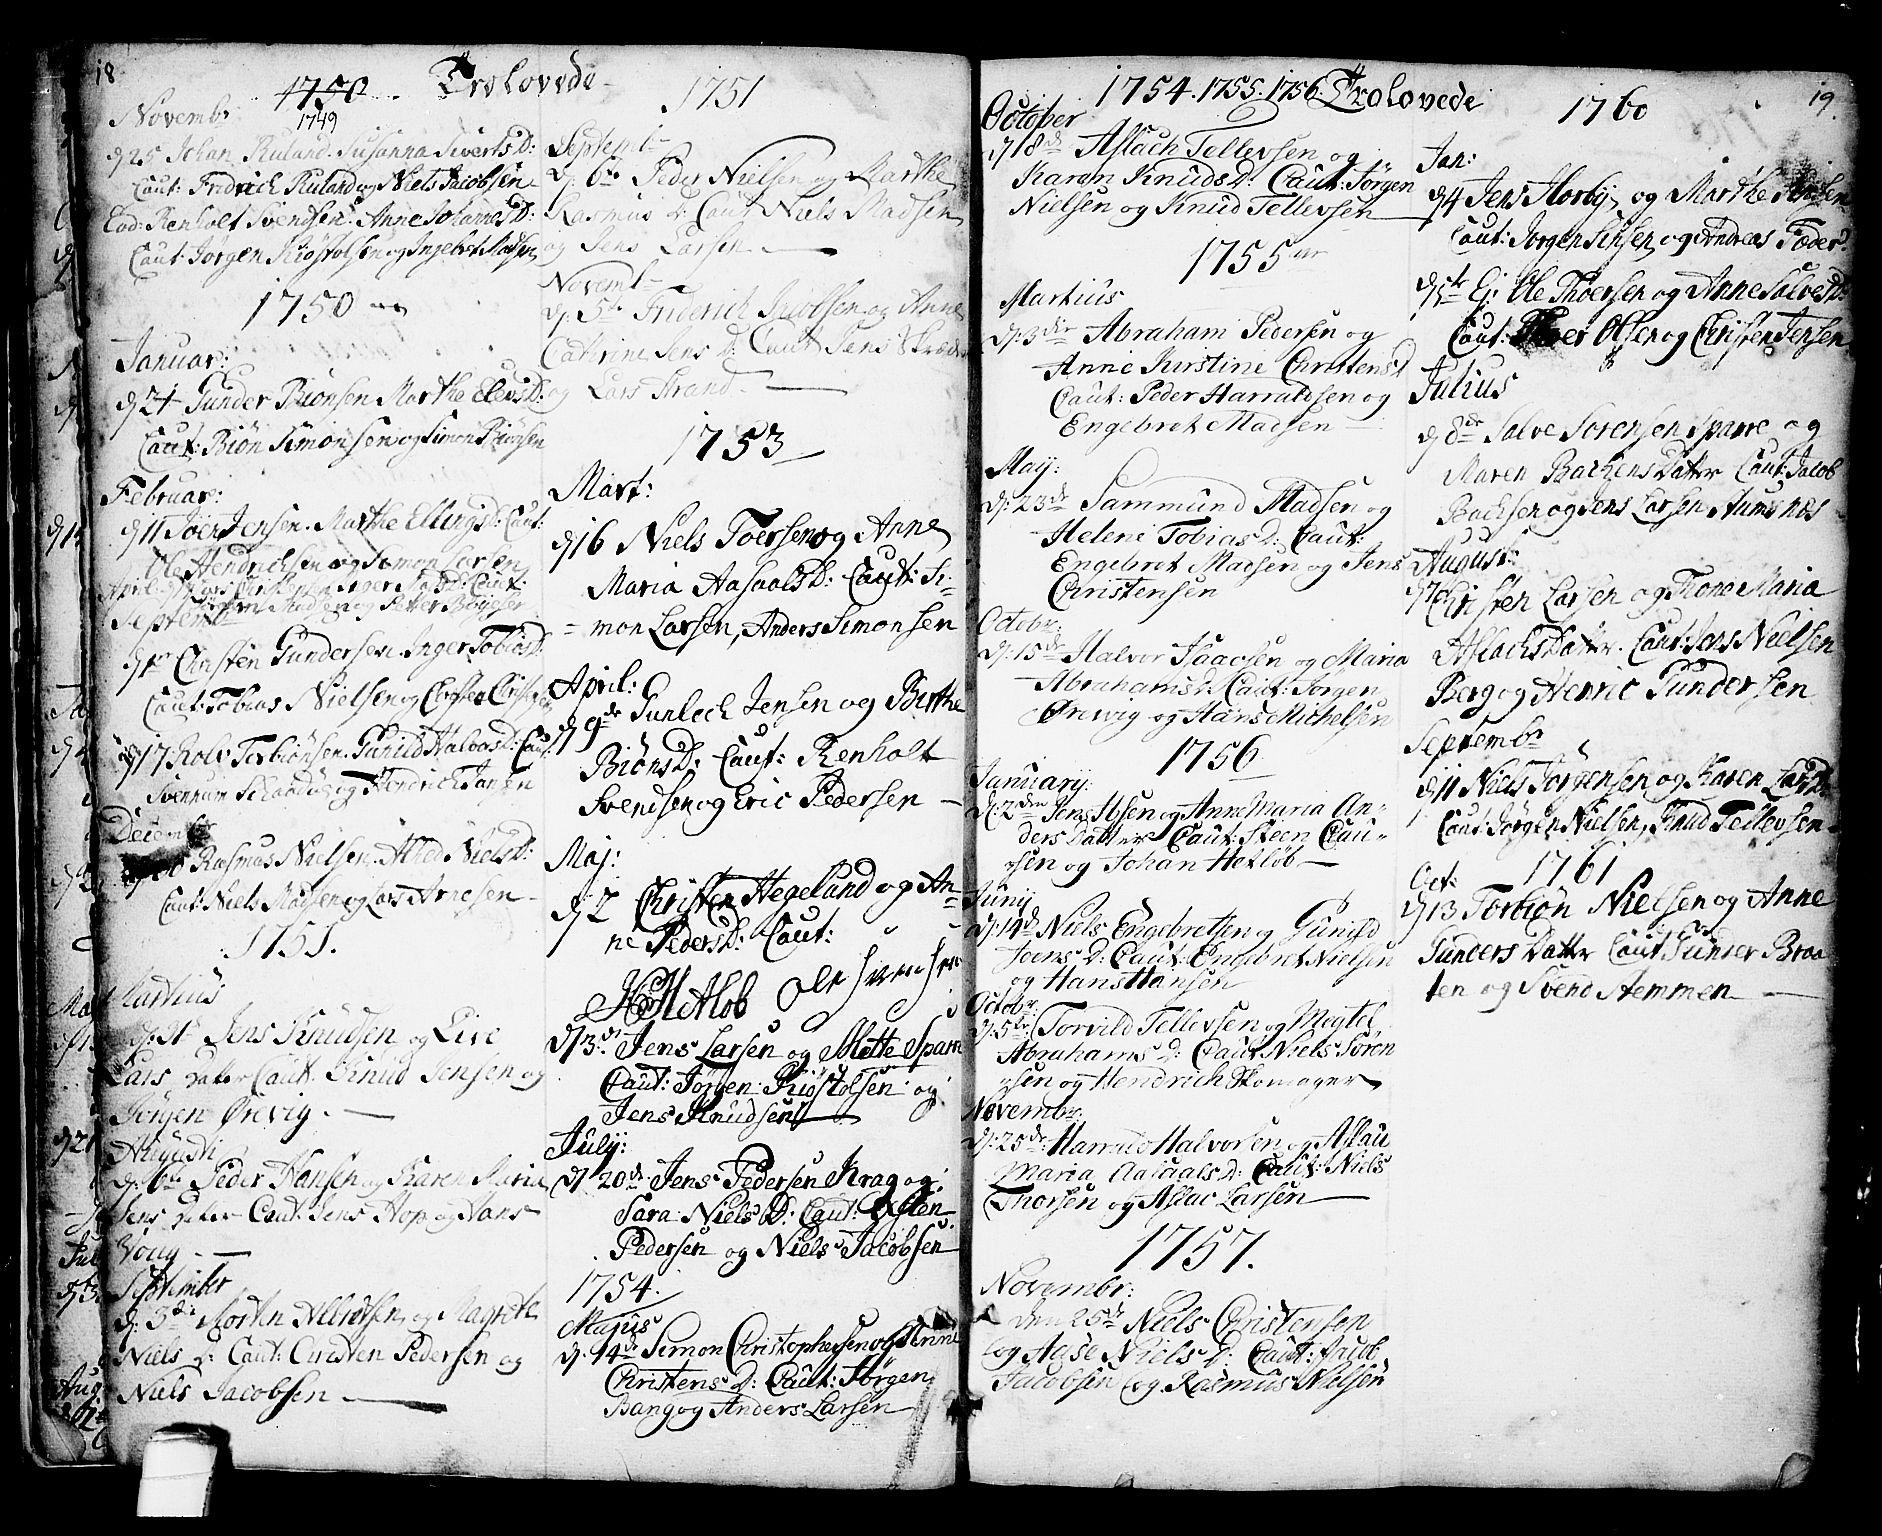 SAKO, Kragerø kirkebøker, F/Fa/L0001: Ministerialbok nr. 1, 1702-1766, s. 18-19